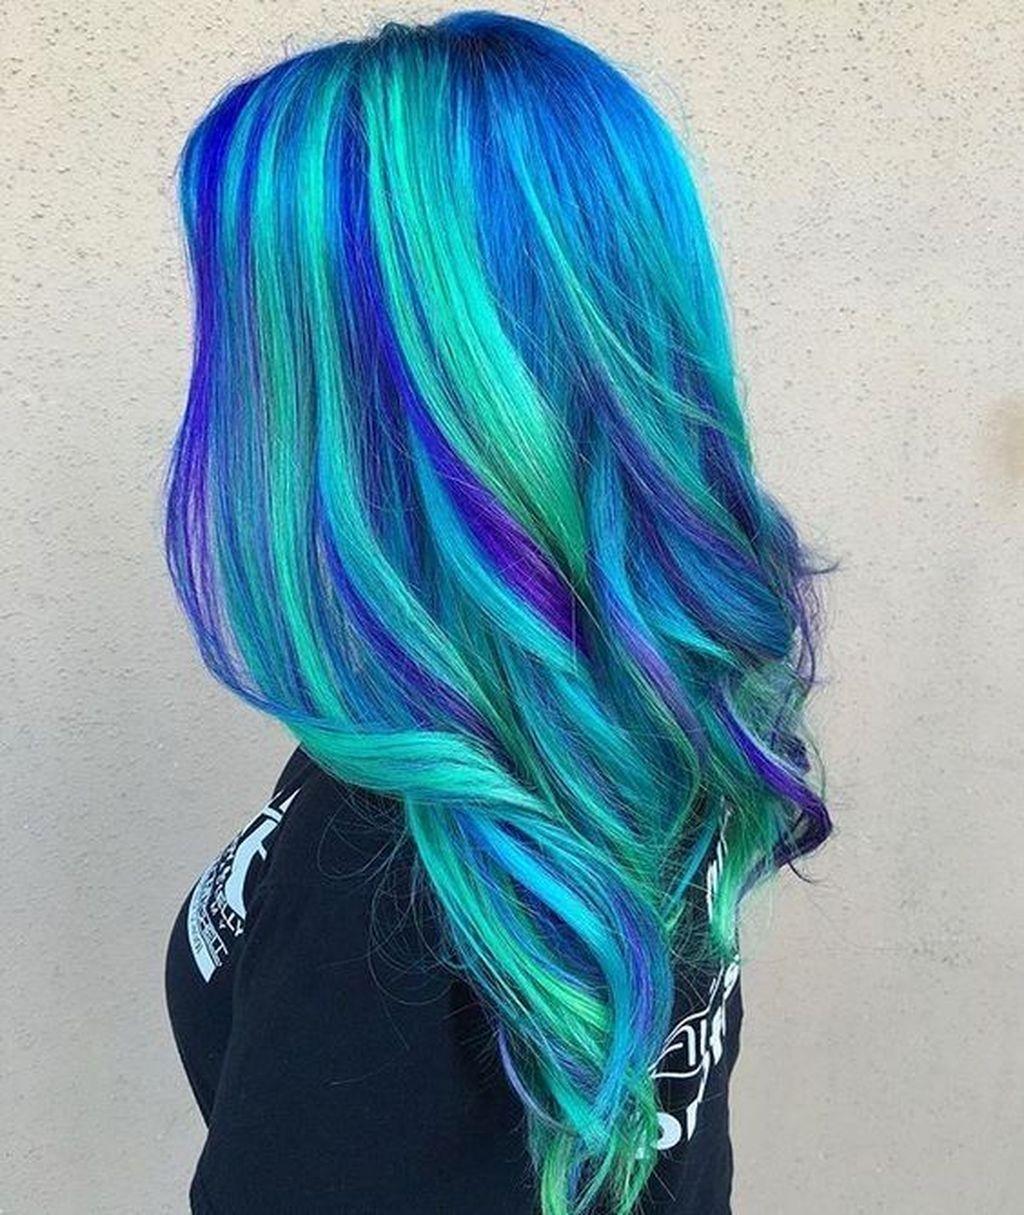 50 latest hair color ideas trends ideas for women 2019